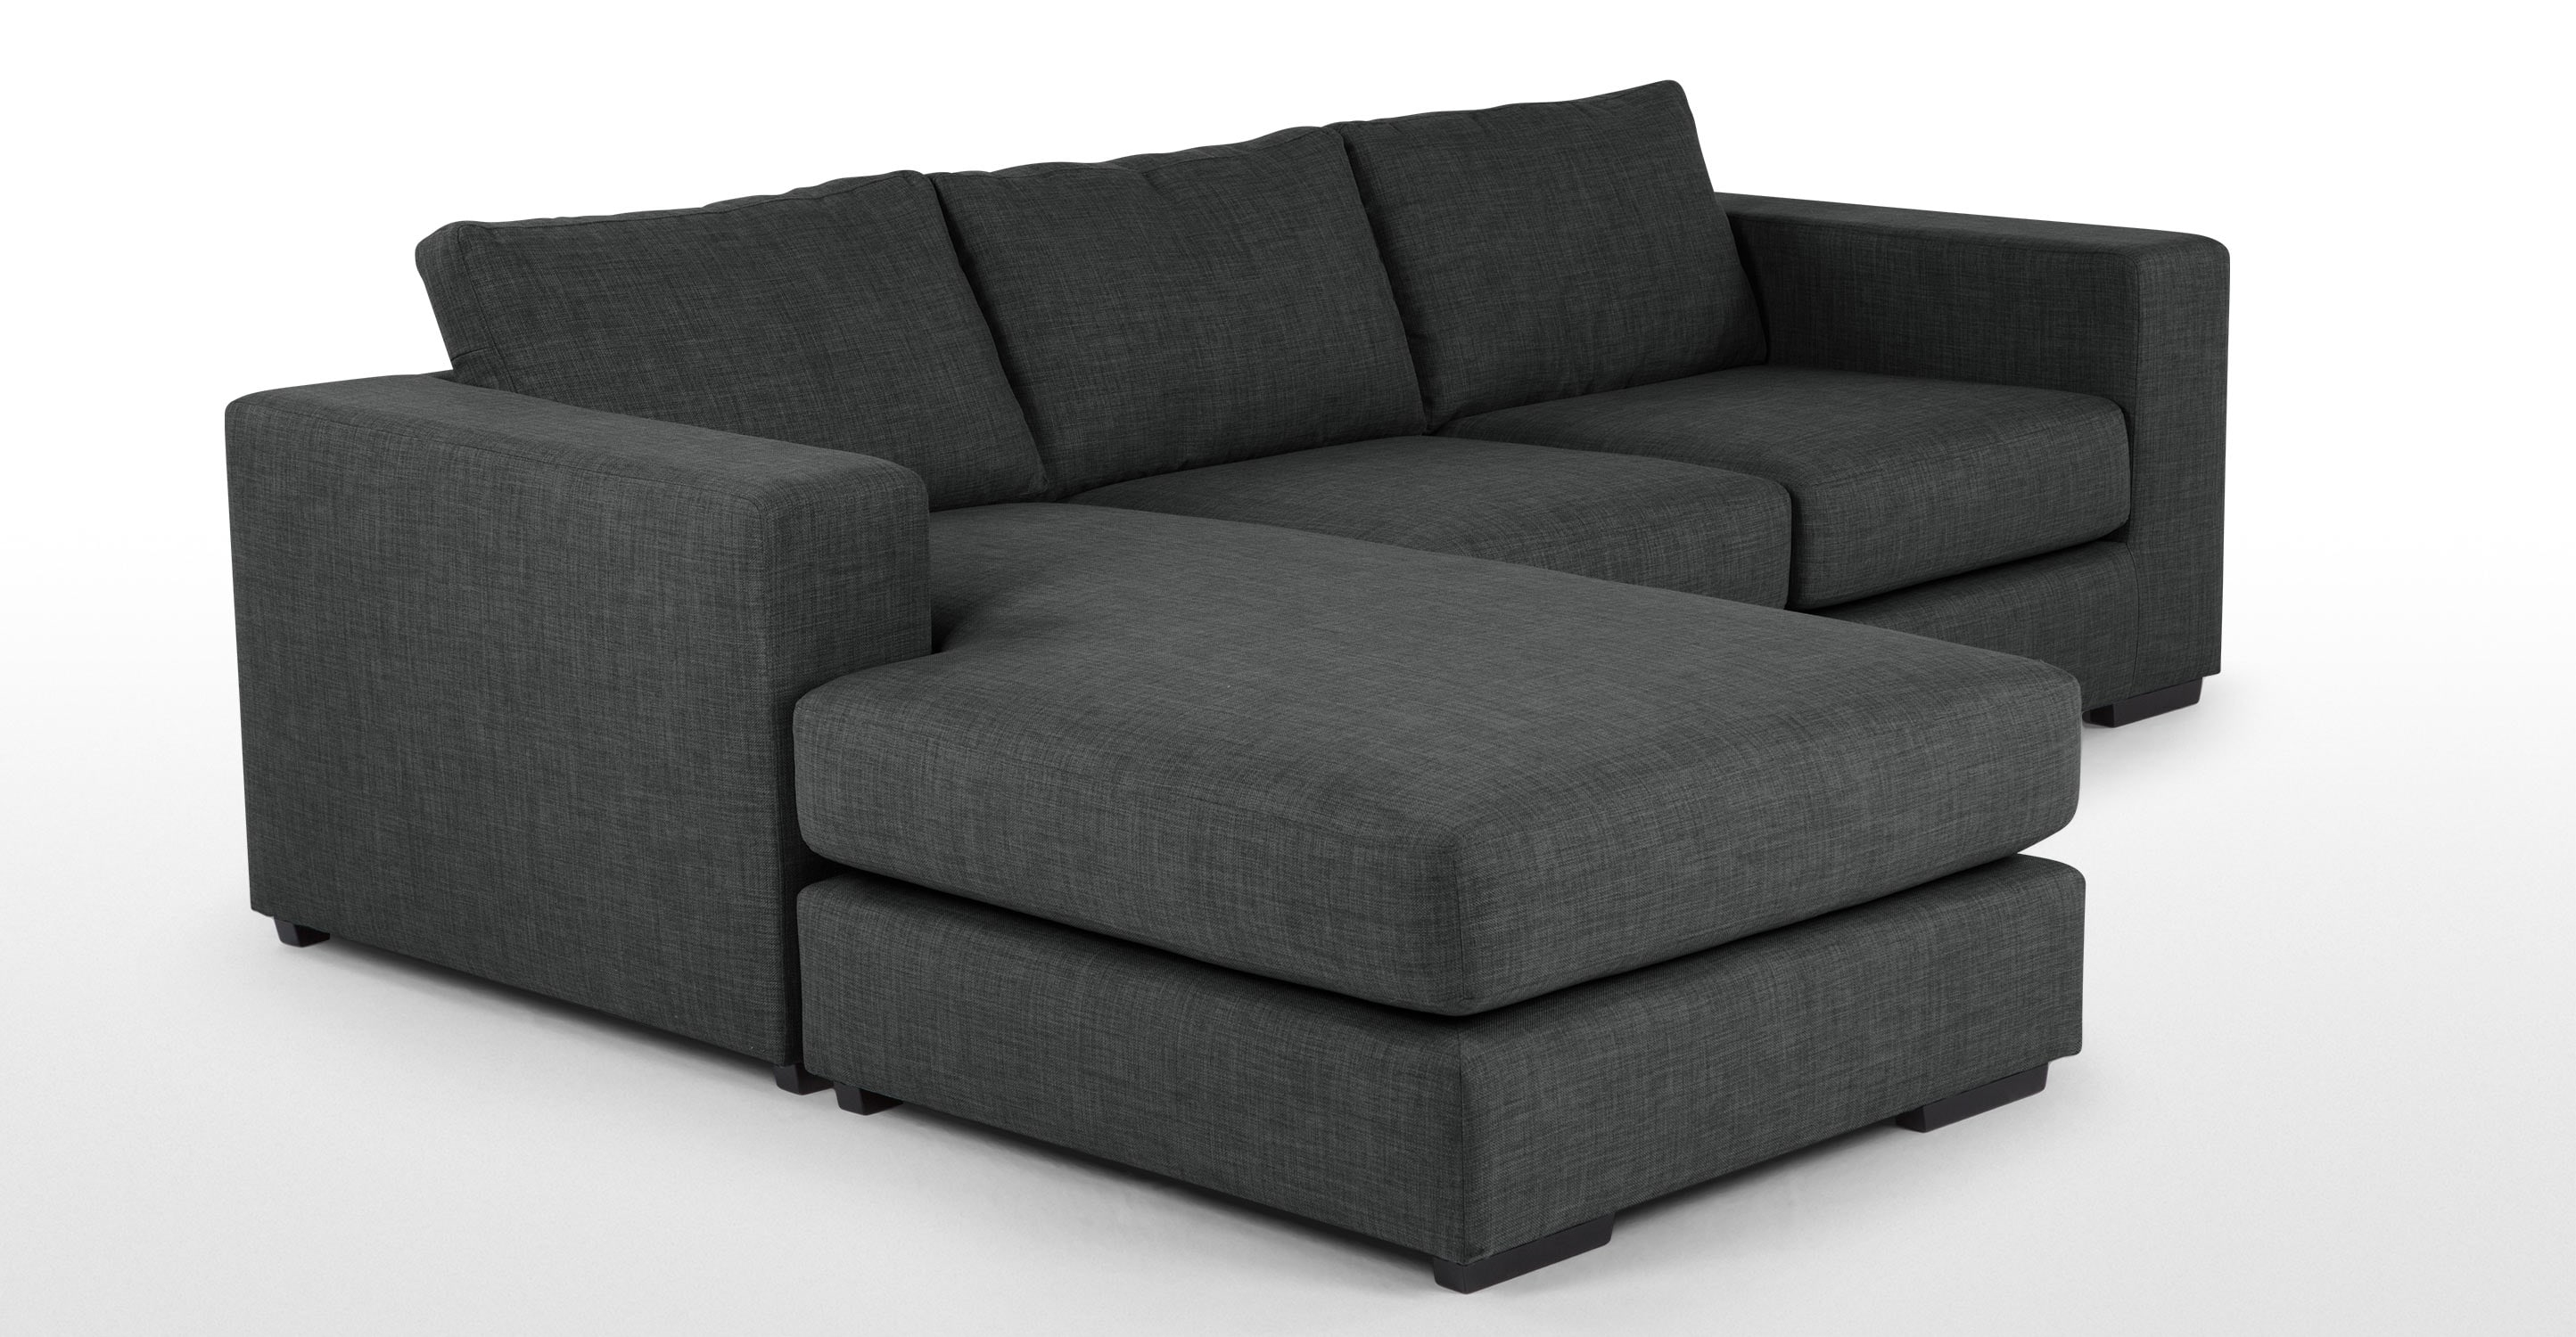 Modular Corner Sofa Hereo Sofa In Modular Corner Sofas (Image 8 of 15)